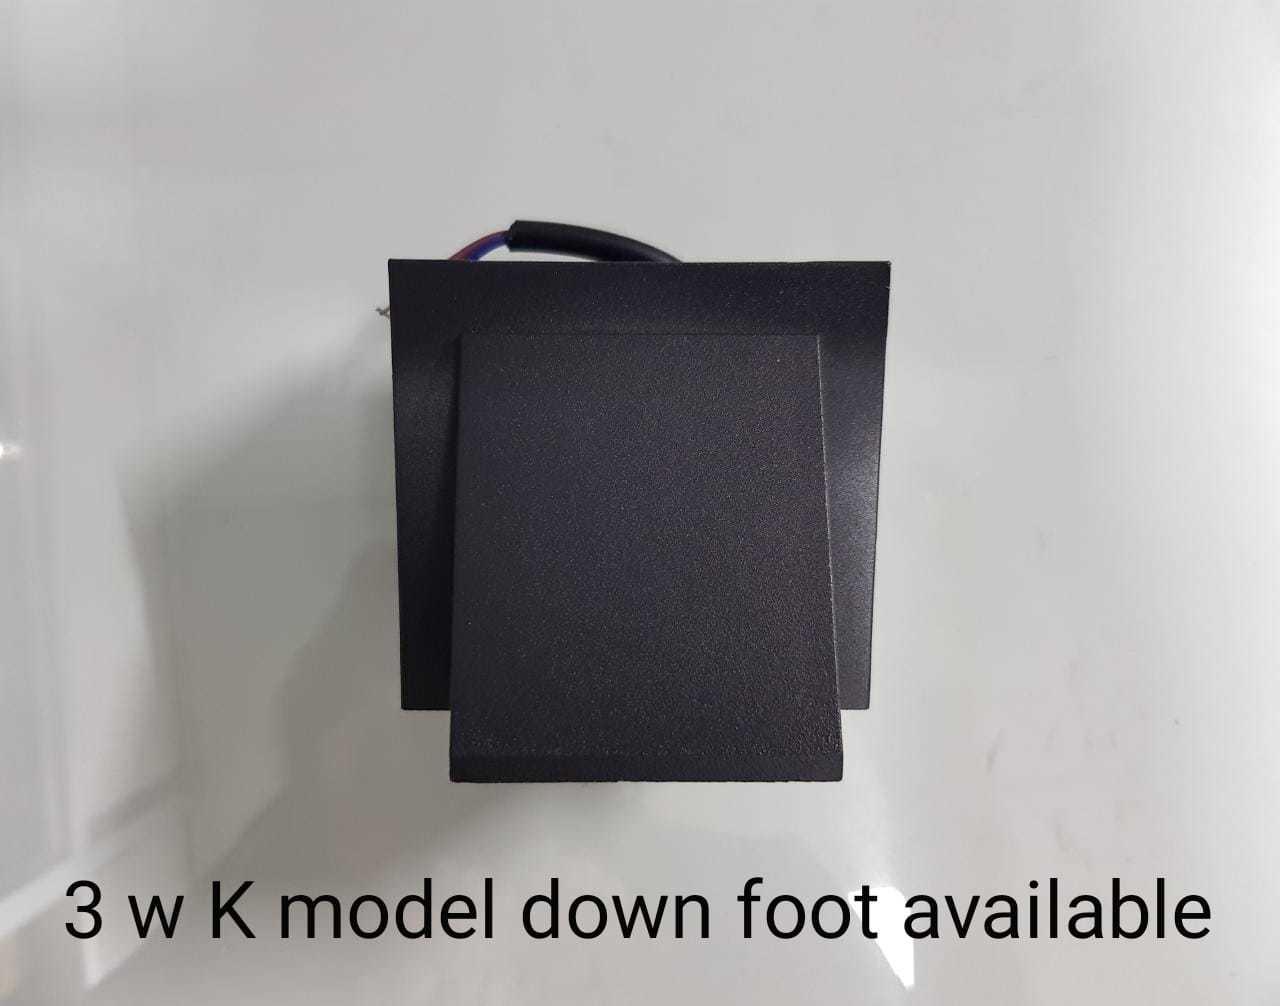 UP-DOWN FOOT LIGHT